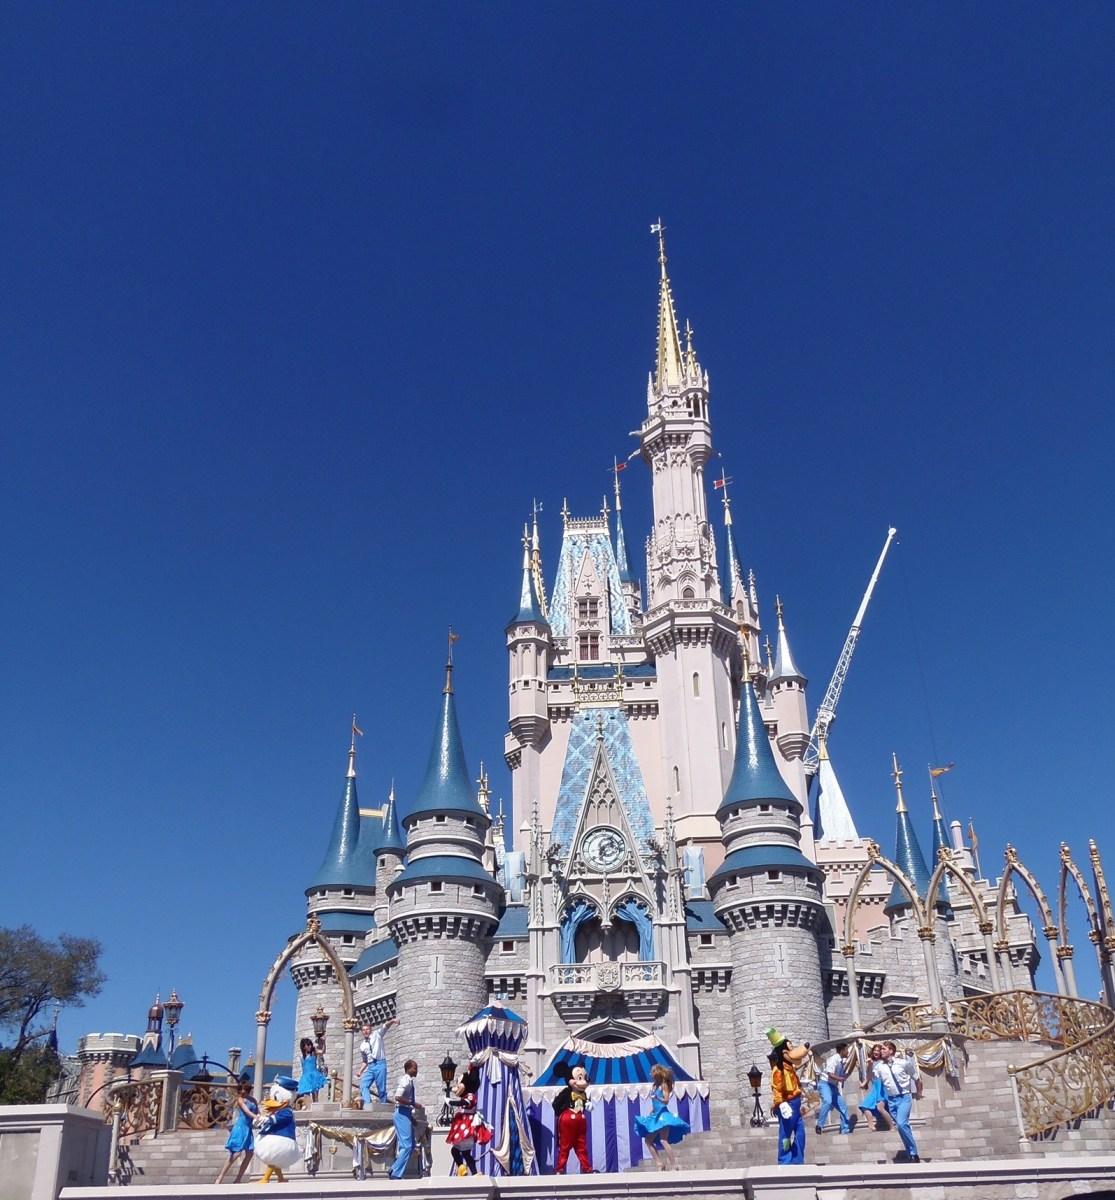 Itens proibidos para levar nos parques de Orlando (Disney, Universal e SeaWorld)